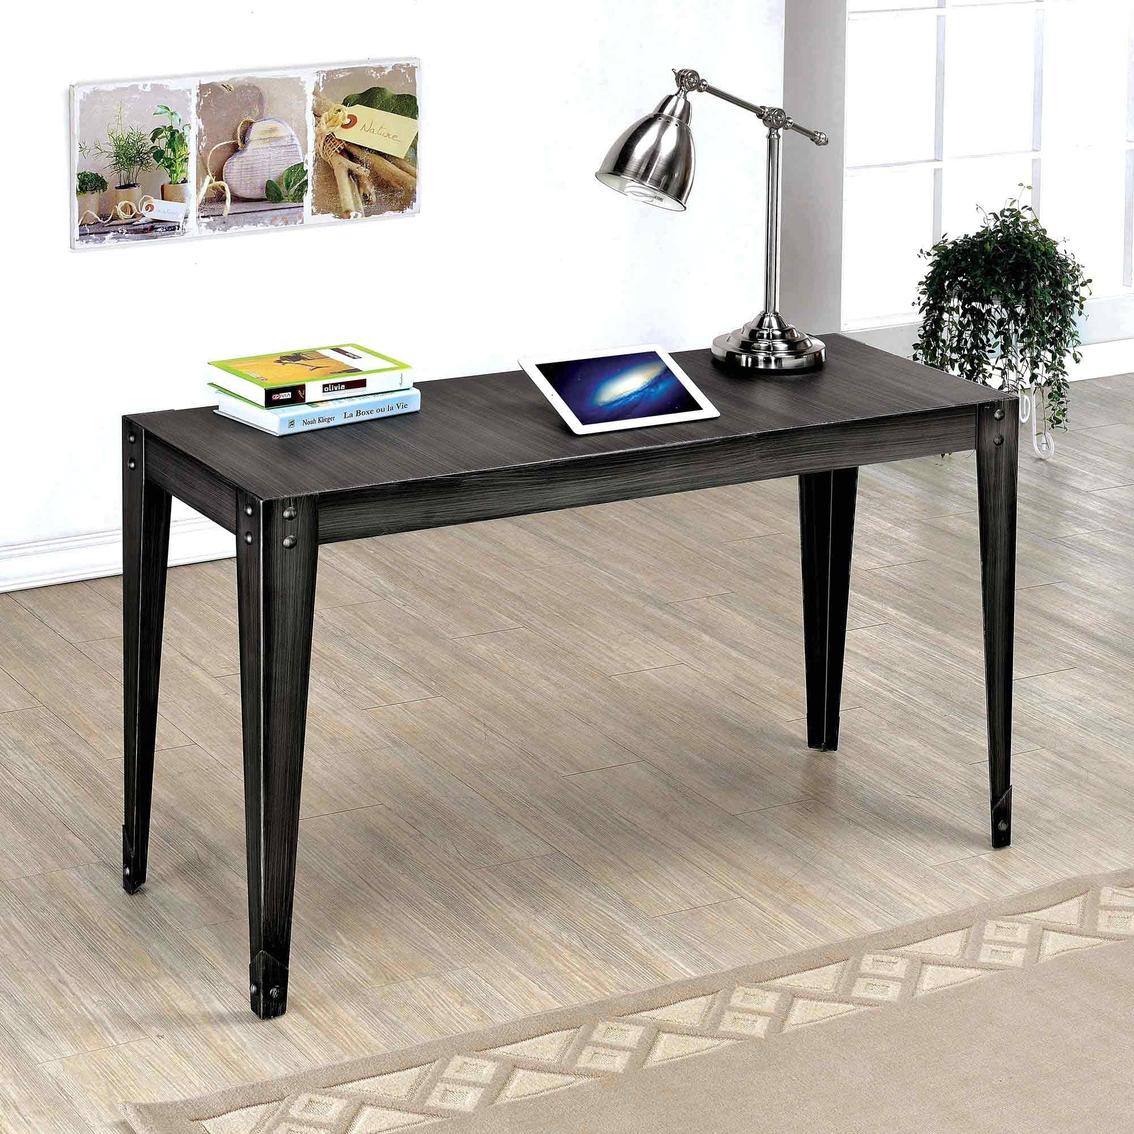 Furniture of america floyd sofa table living room tables for Furniture of america sofa table